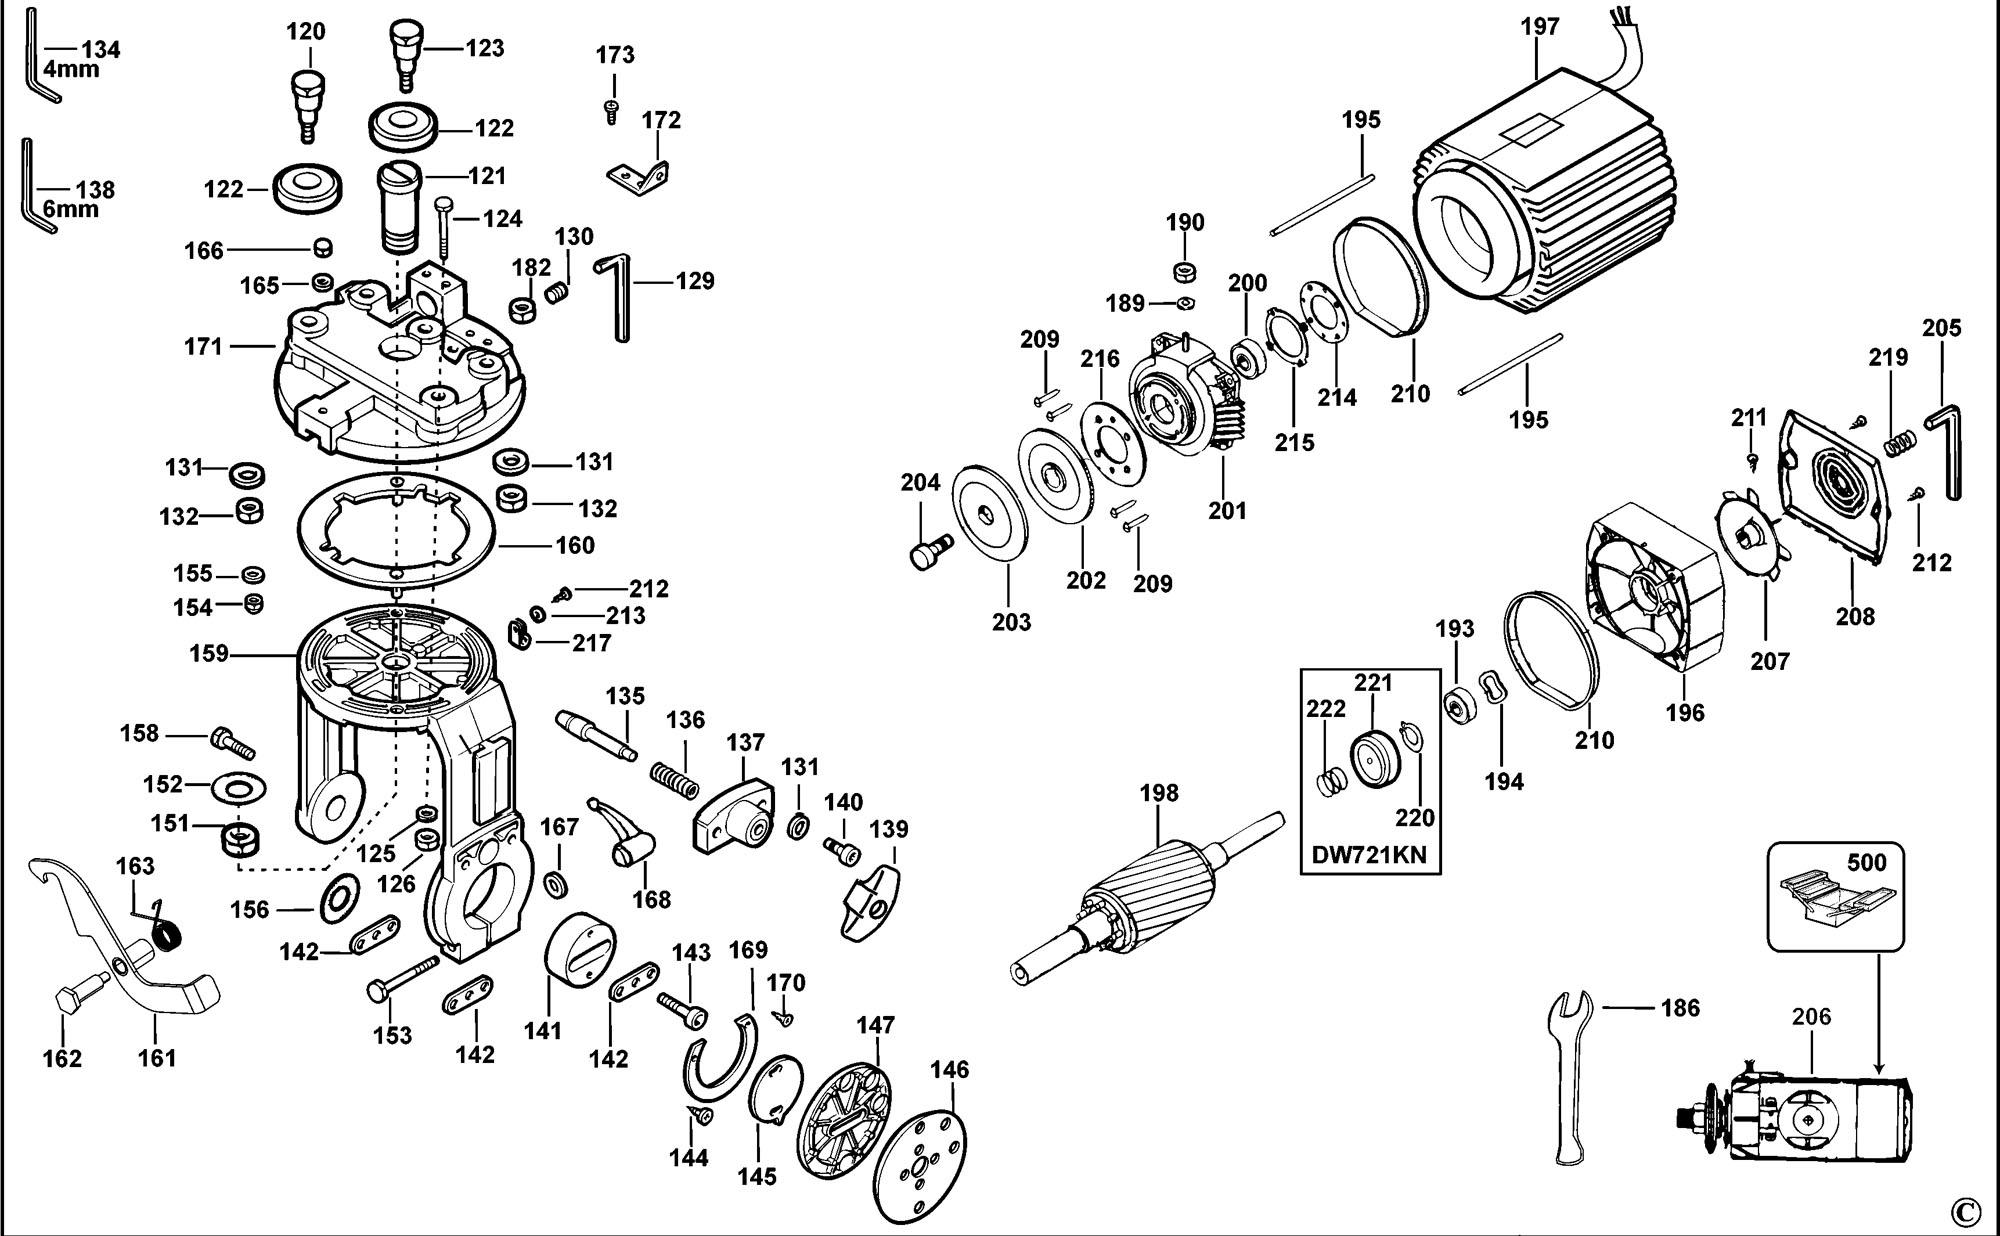 spares for dewalt dw721kn radial arm saw  type 1  spare De Walt Radial Arm Saw Accessories dewalt 770 radial arm saw parts list